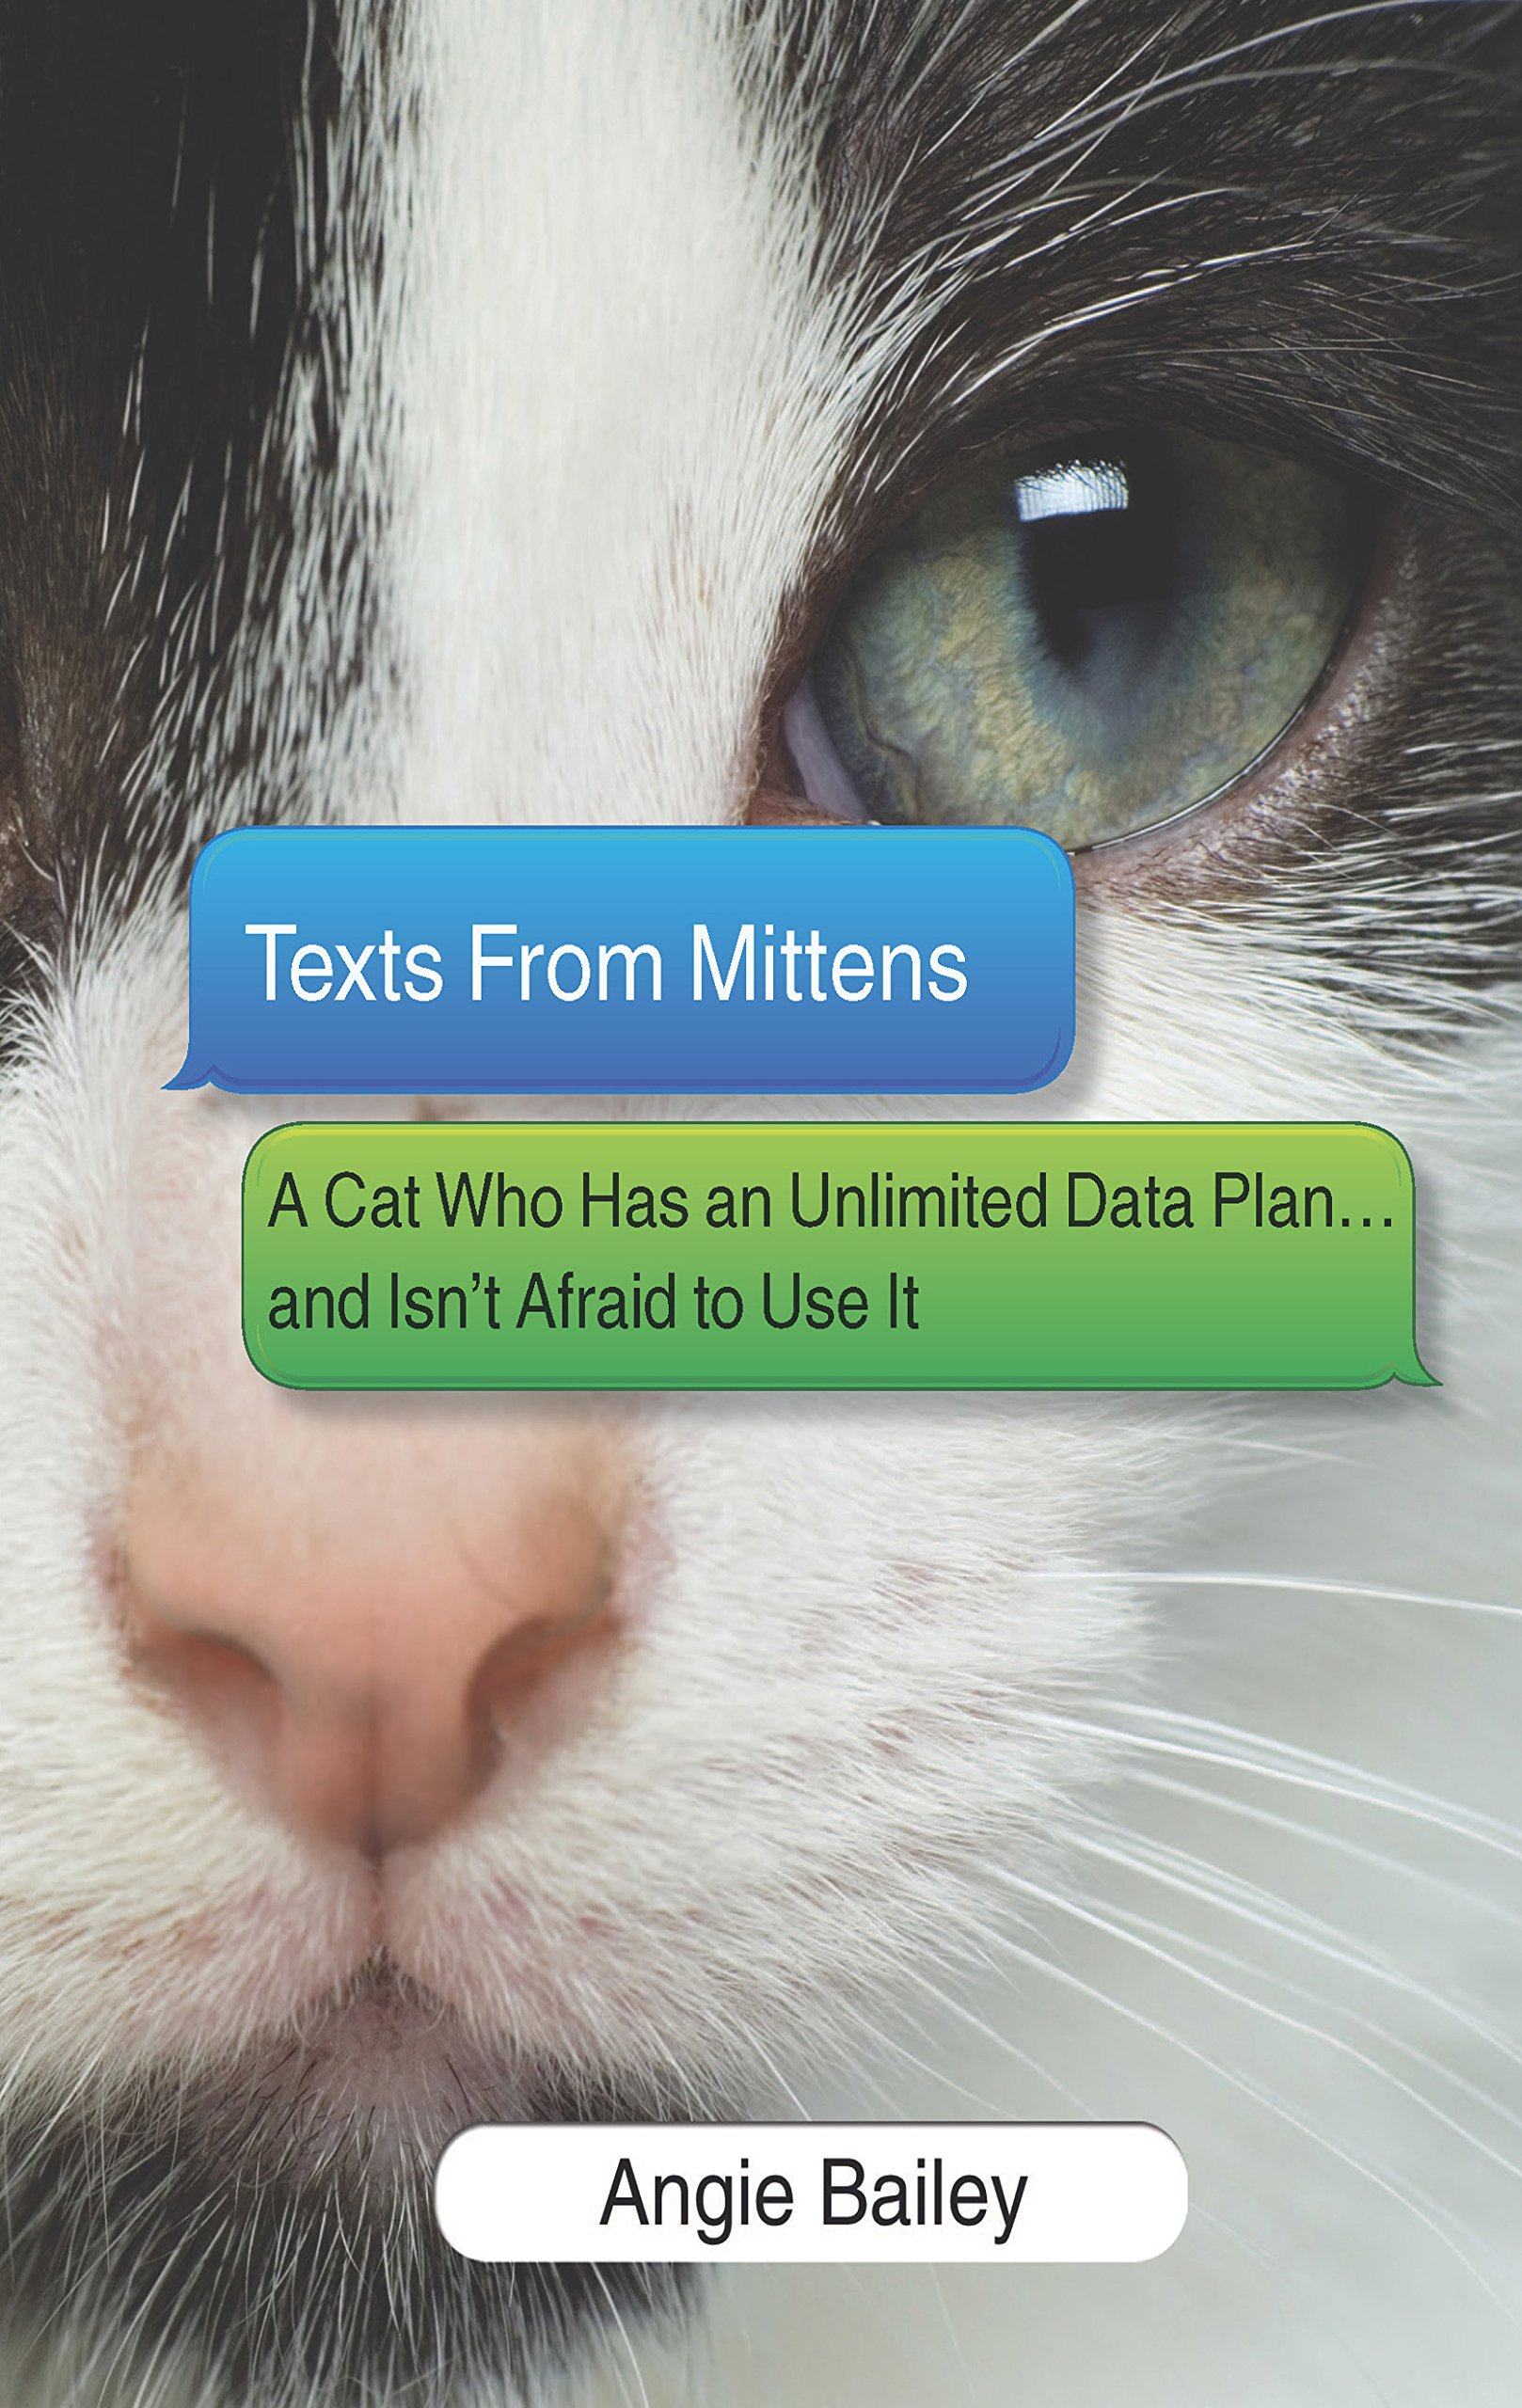 Texts Mittens Unlimited Data Afraid